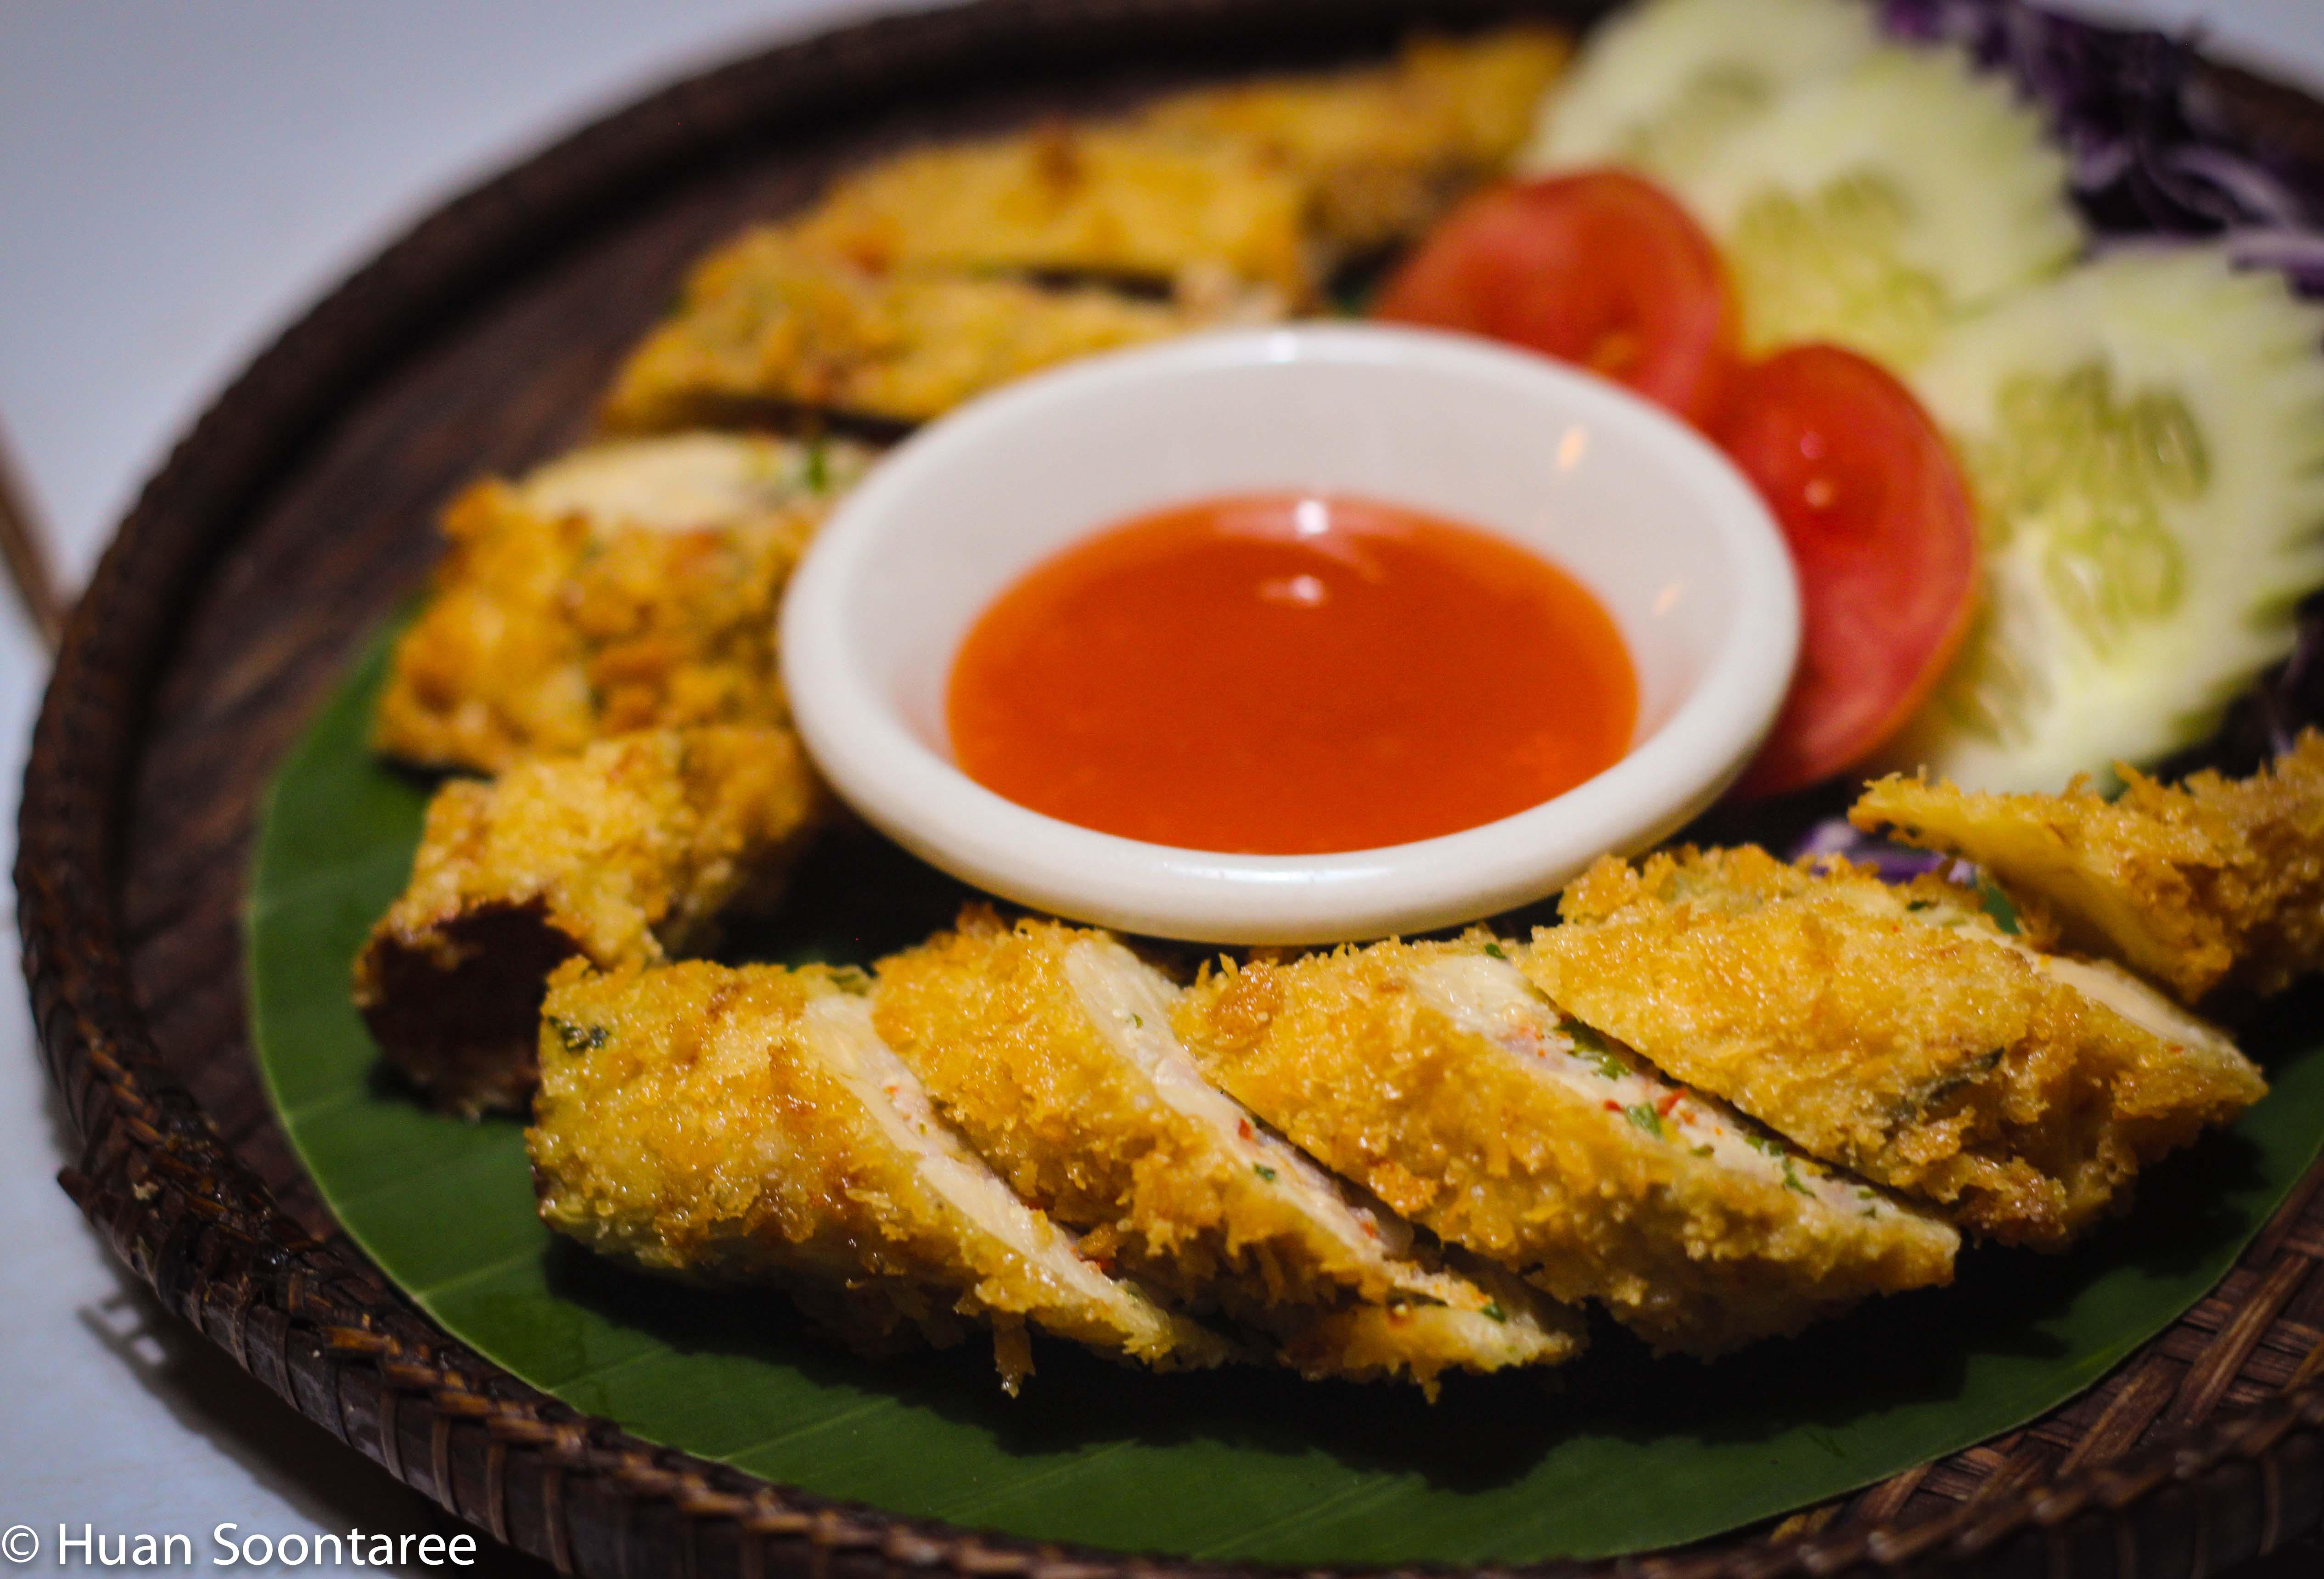 06 Stuffed bamboo shoots tempura